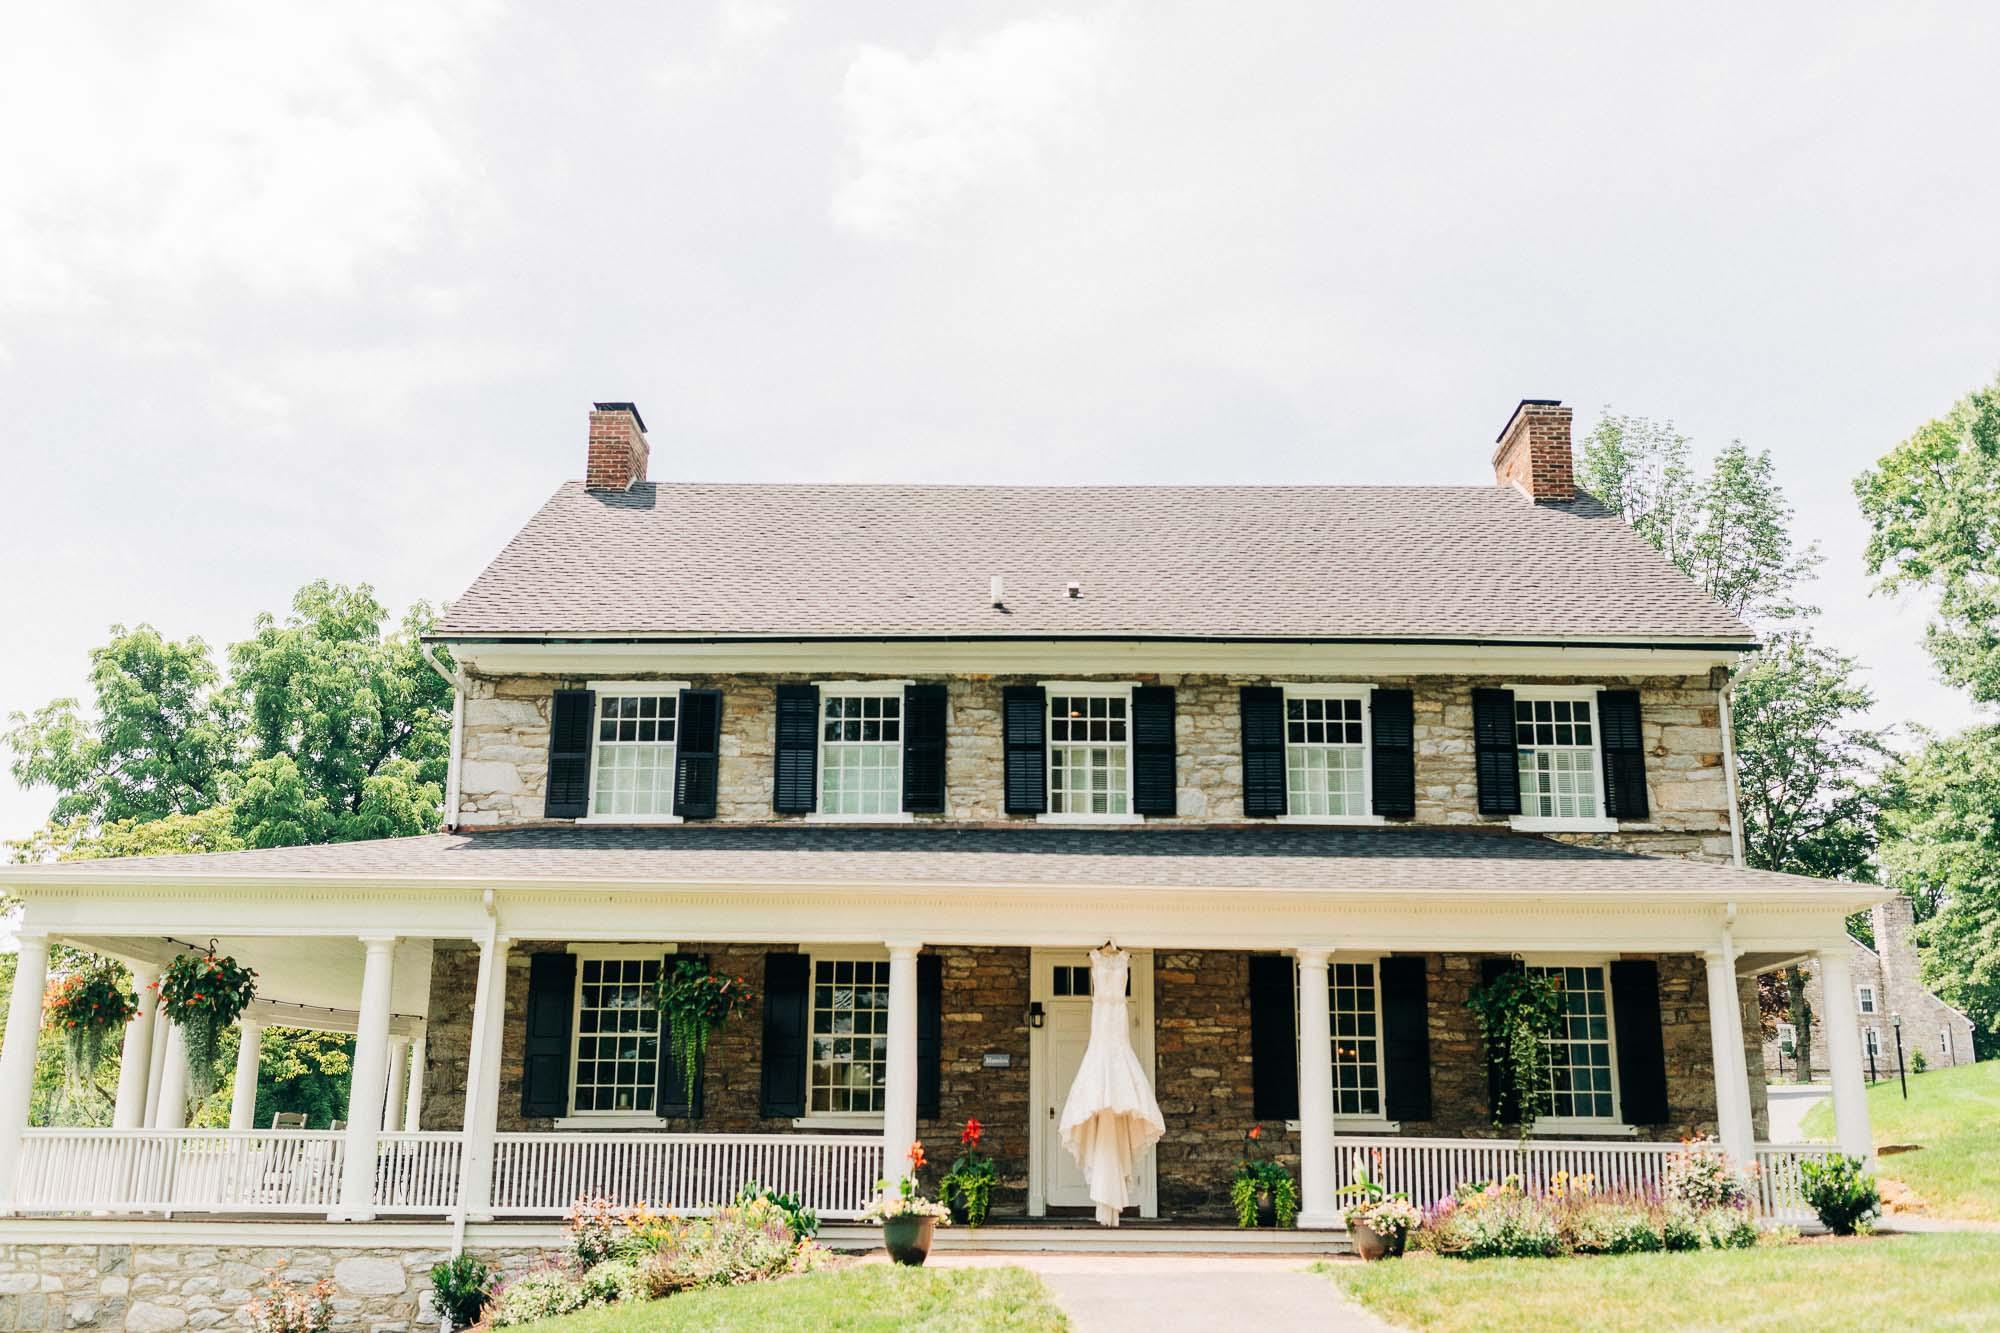 Allenberry-resort-historic-pennsylvania-wedding-19621.jpg